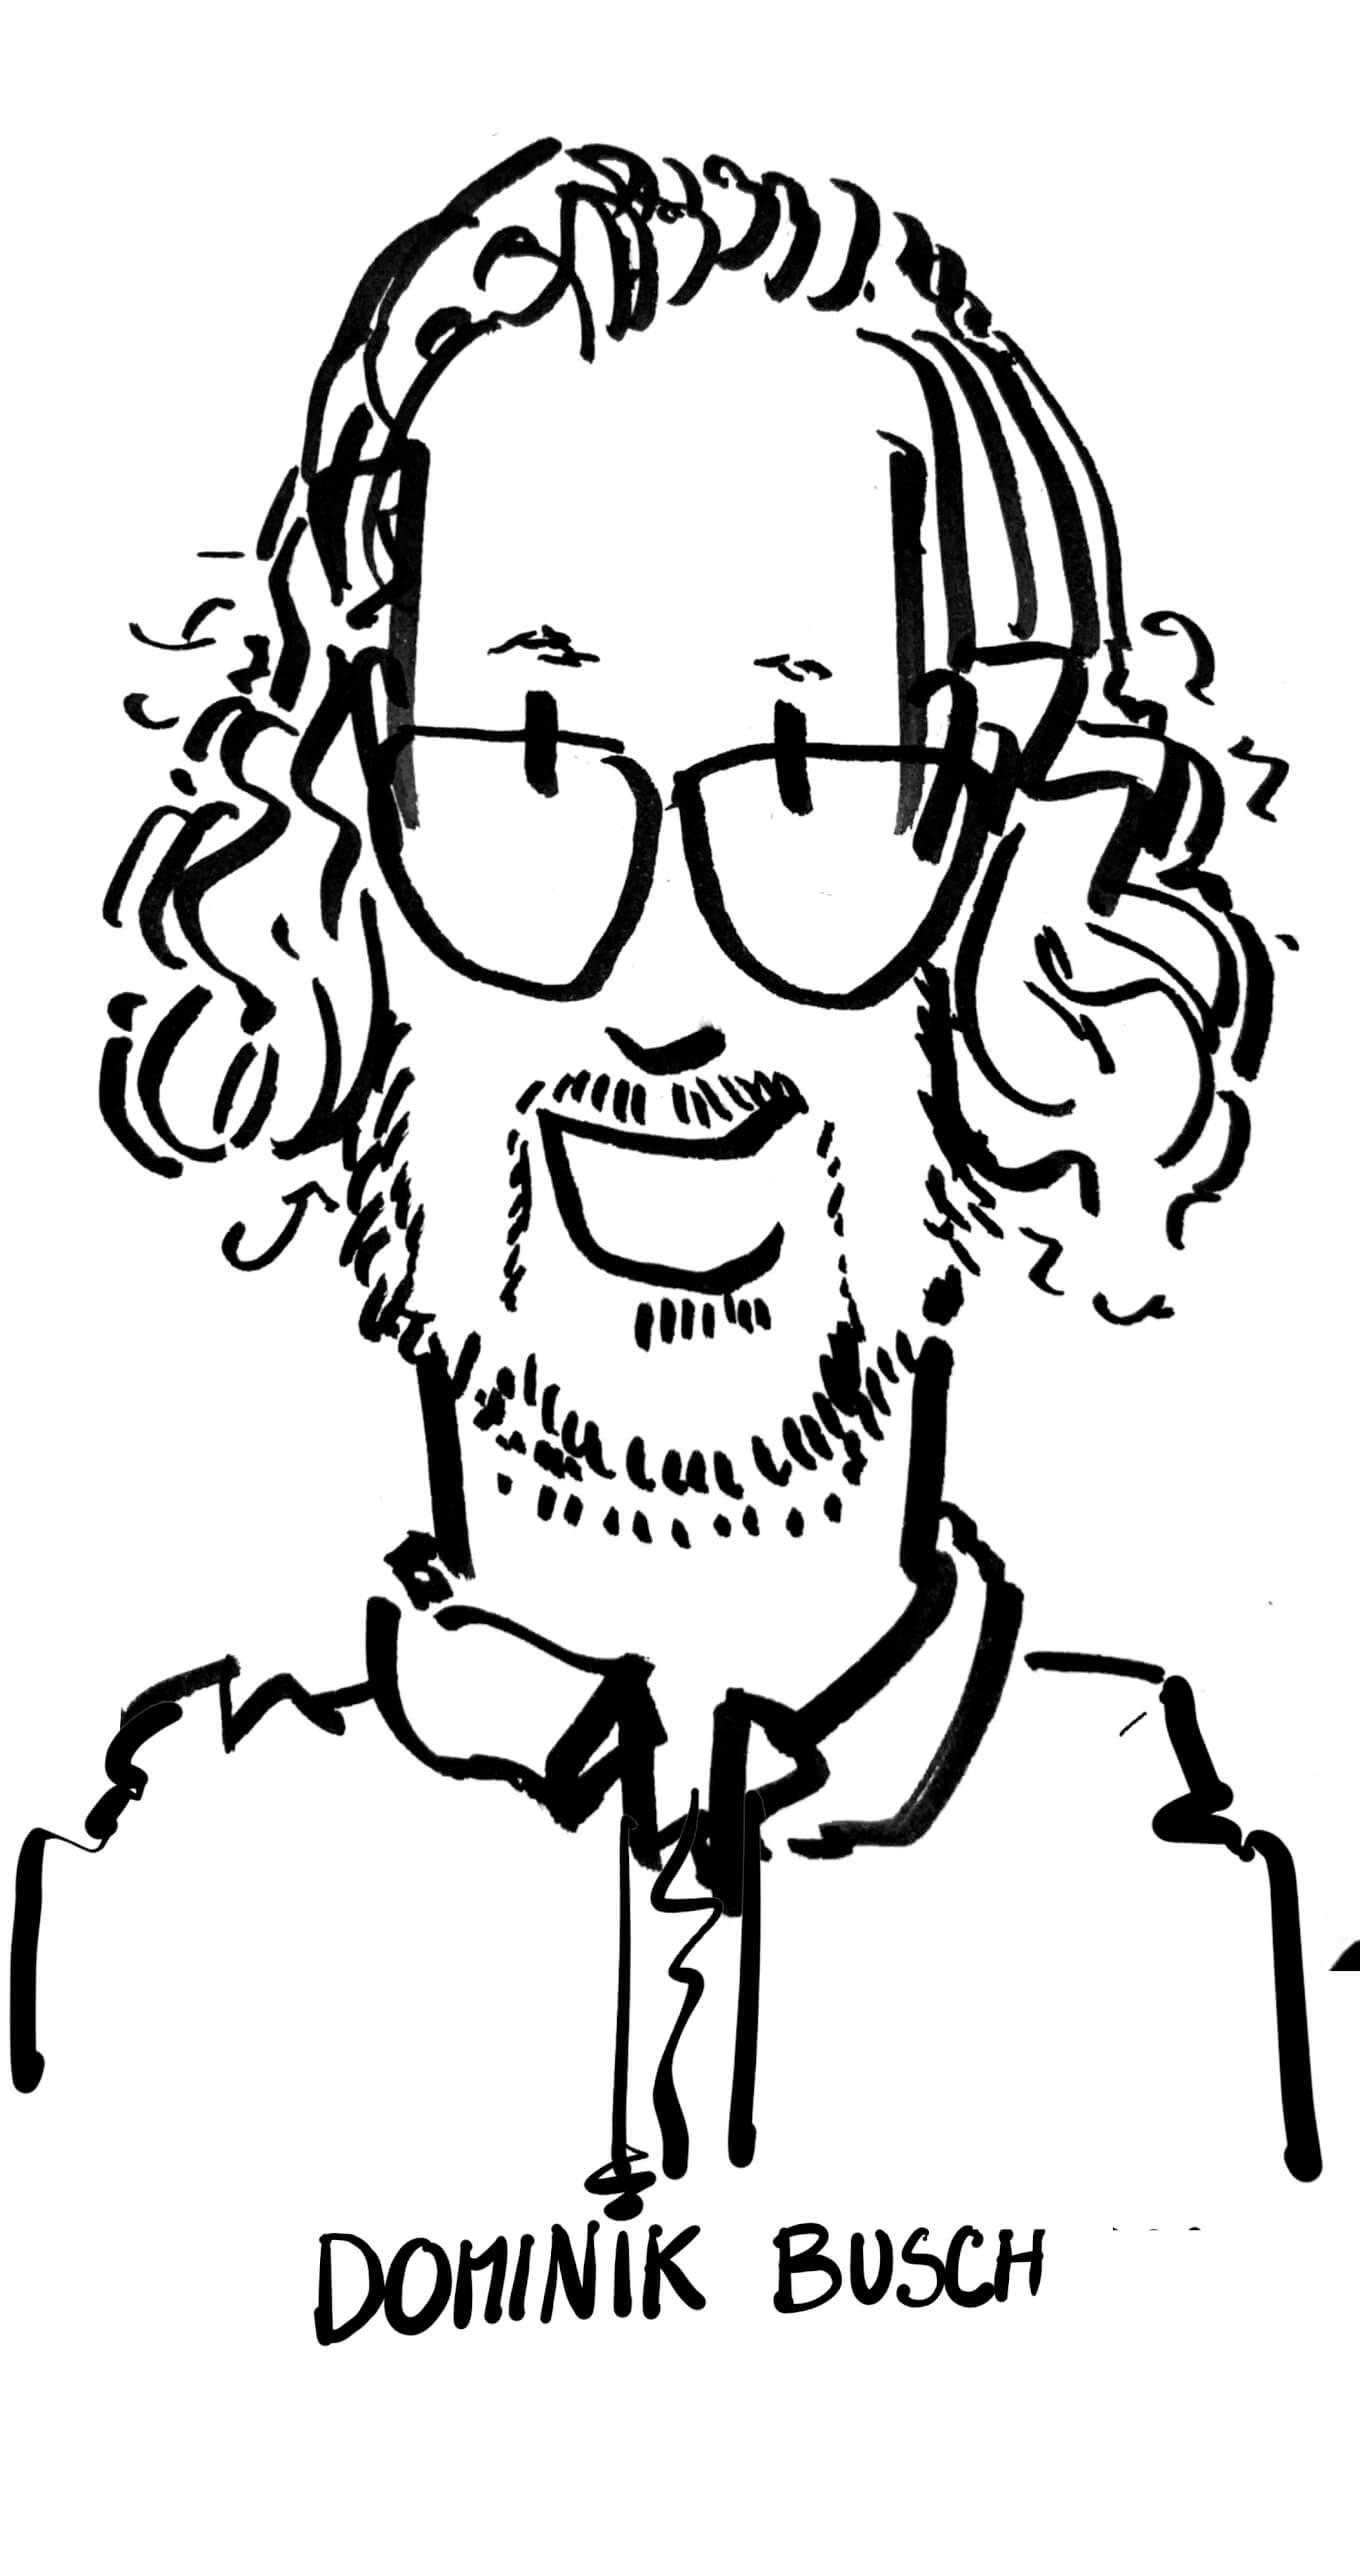 Dominik Busch